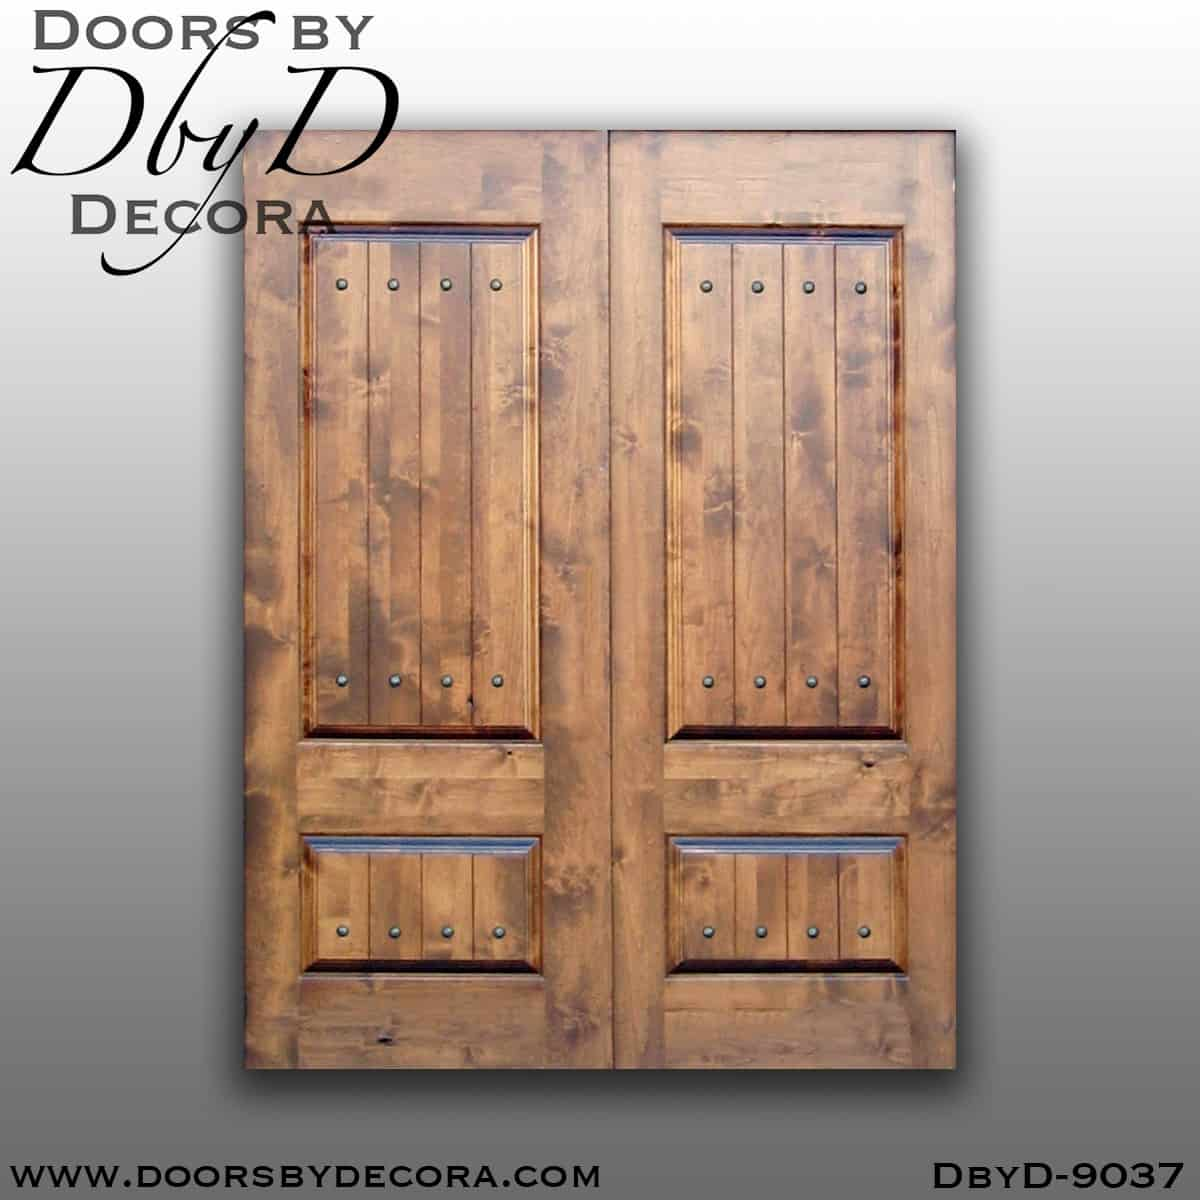 Custom Specialty Wood Interior Barn Doors Solid Wood Doors By Decora